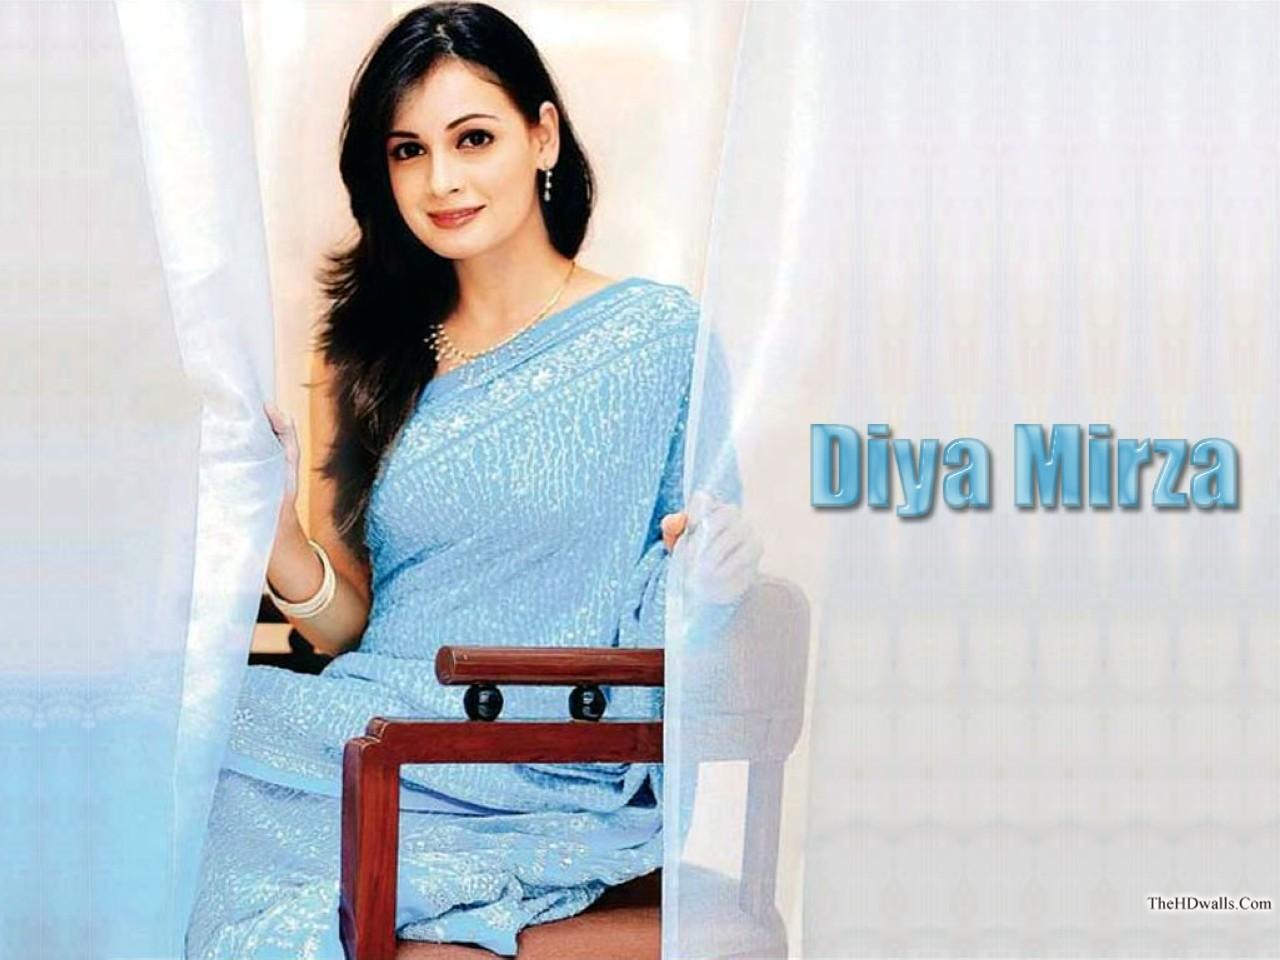 Bollywood Diya Mirza Wallpapers 5 images AbuDtcmj